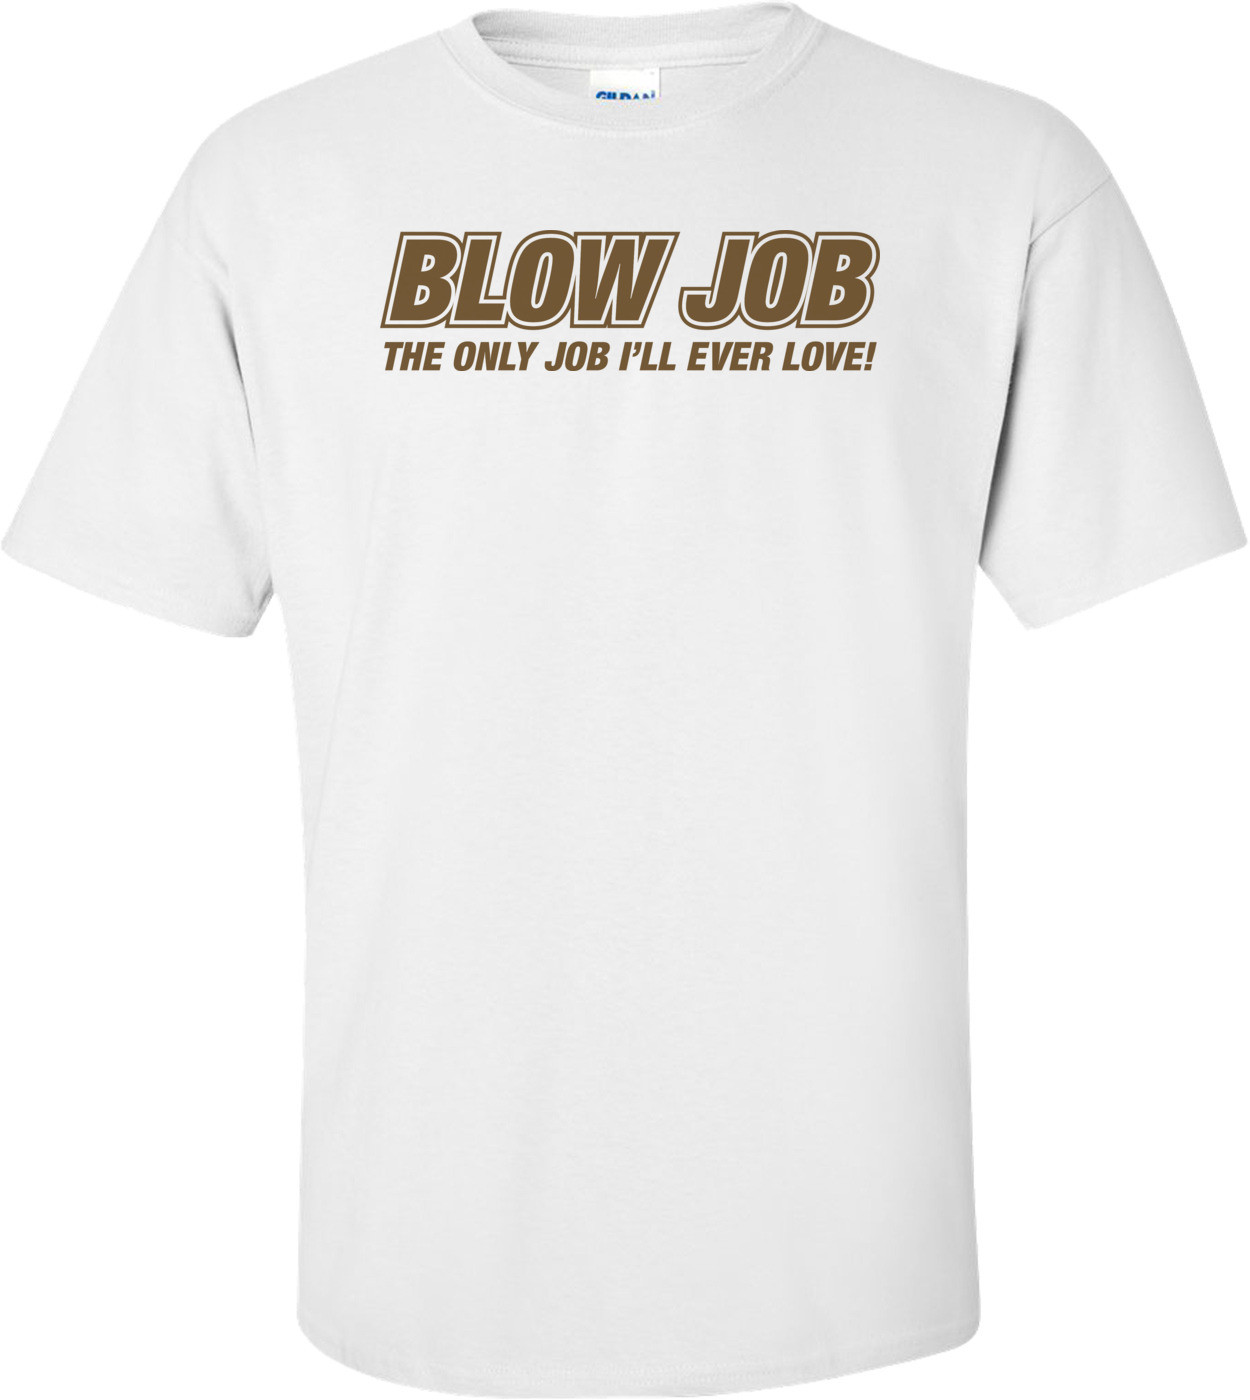 Blow Job The Only Job I'll Ever Love T-shirt